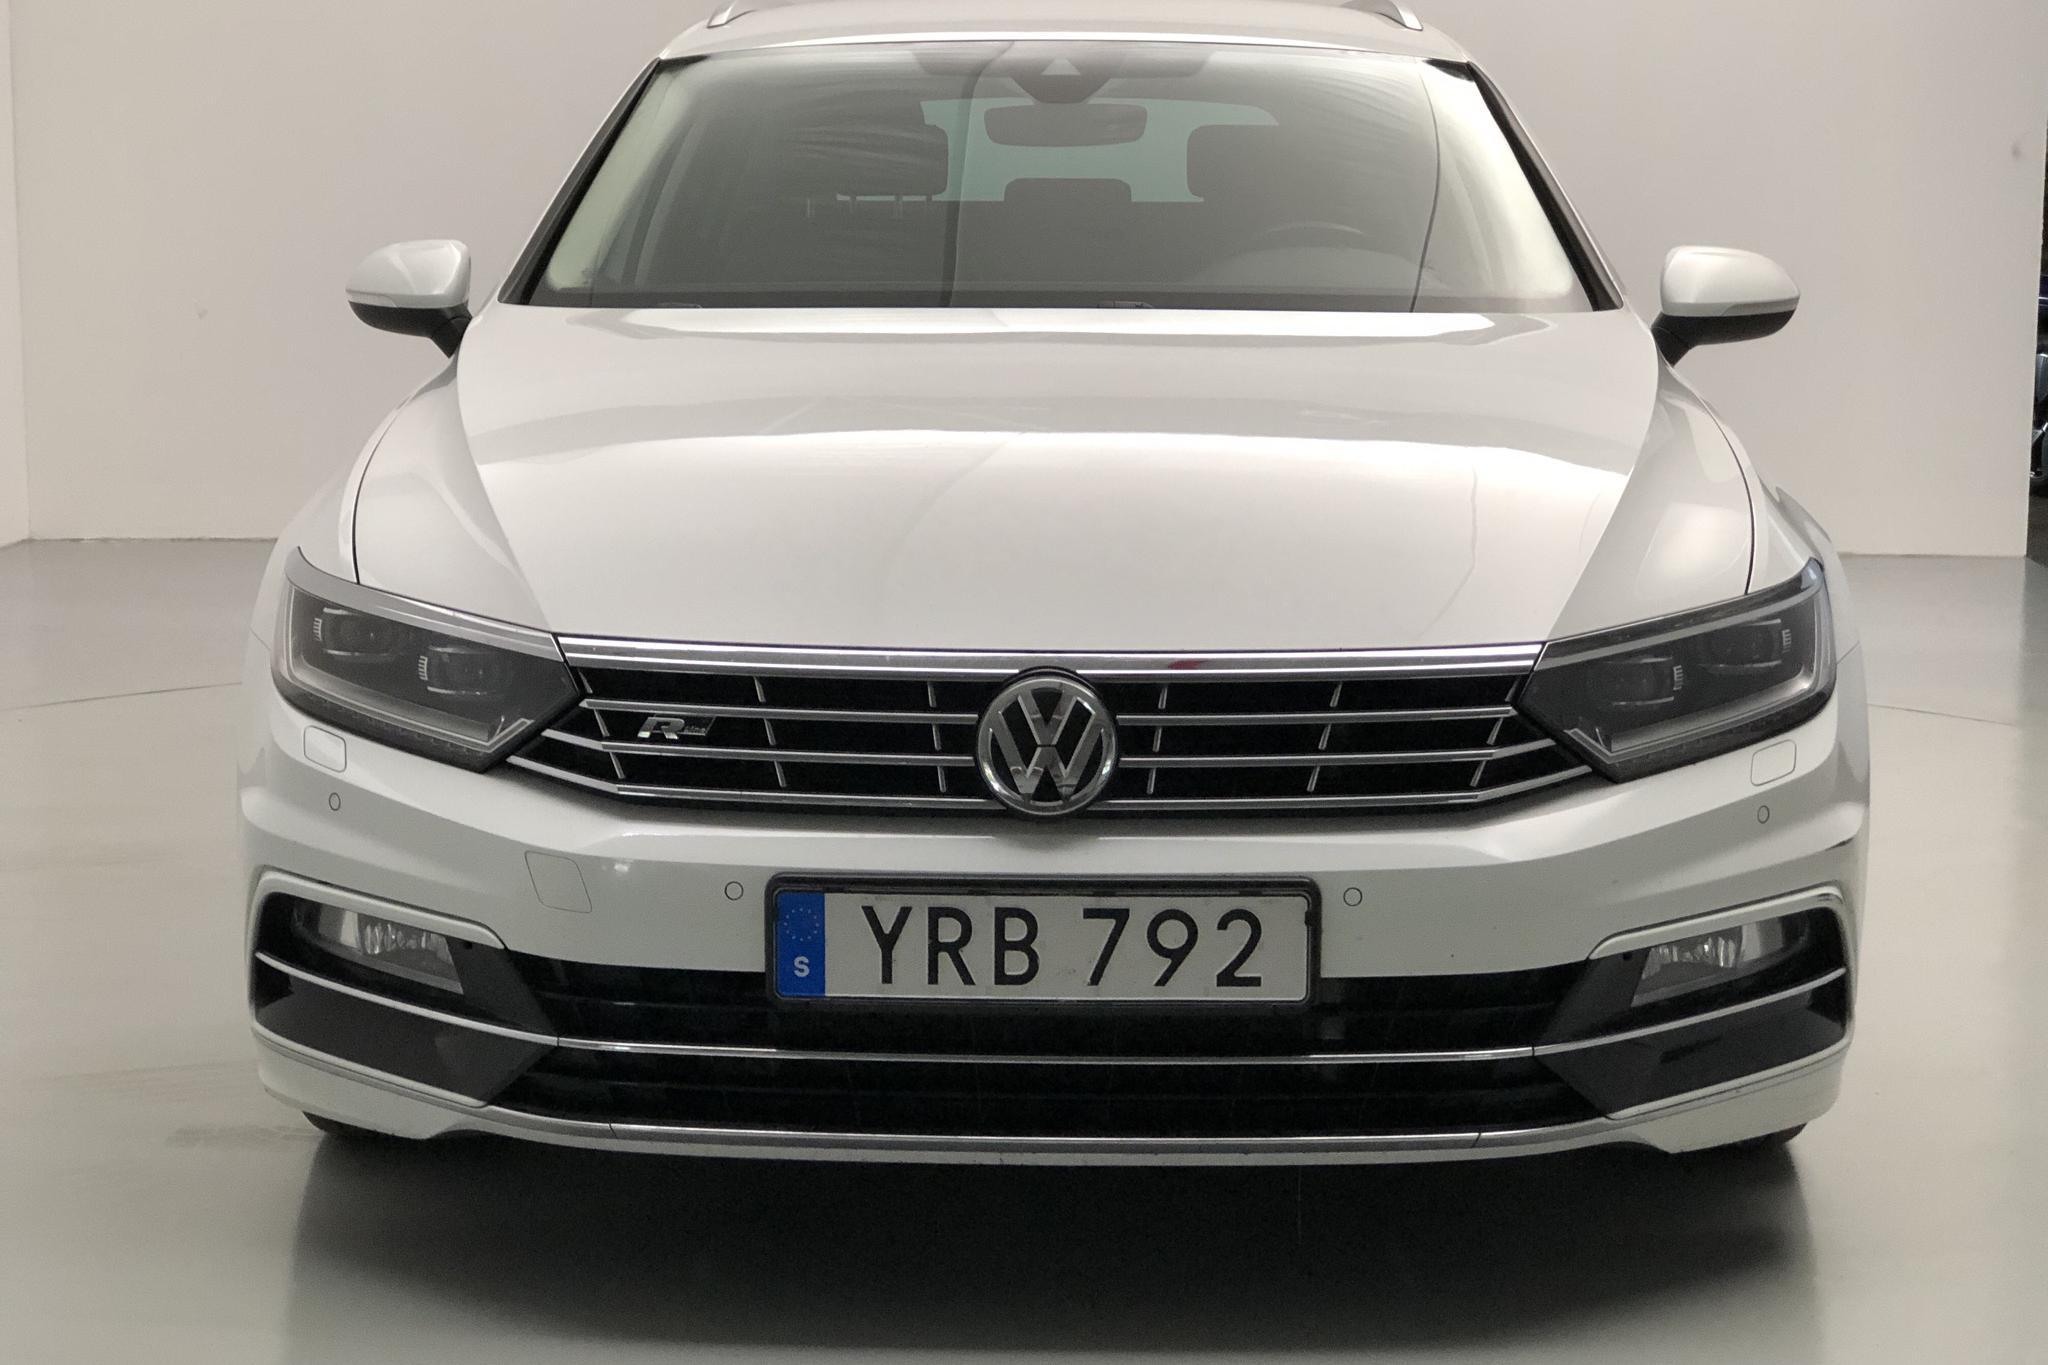 VW Passat 2.0 TDI Sportscombi (190hk) - 115 870 km - Automatic - white - 2019